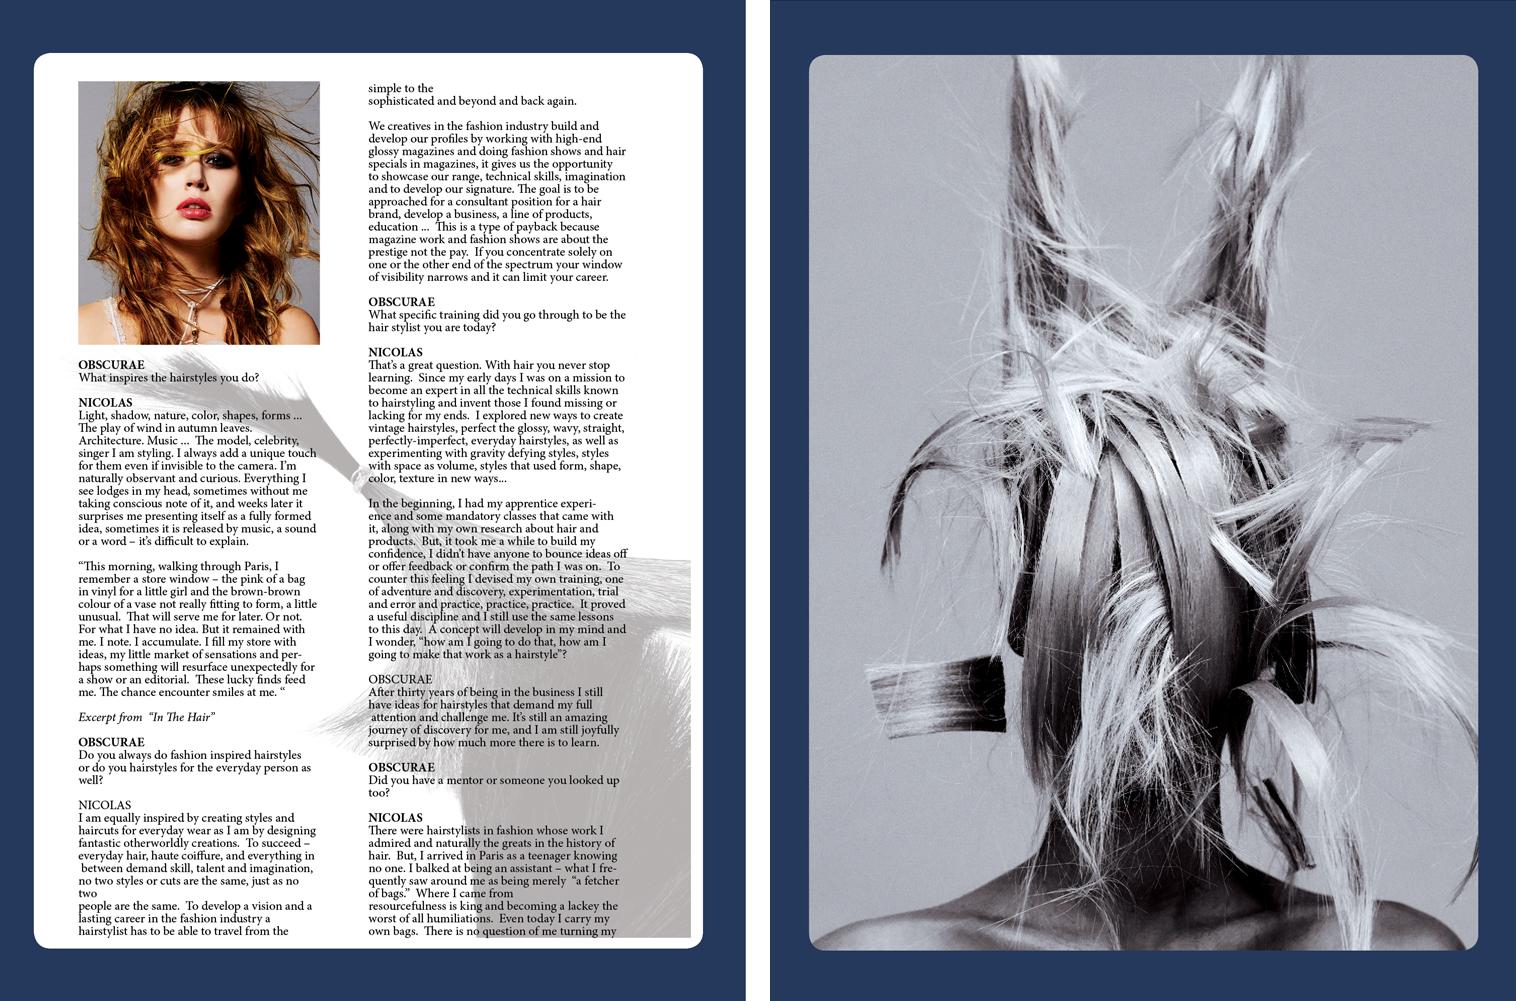 Obscurae Magazine - Nicolas Jurnjack -  Page 76-77